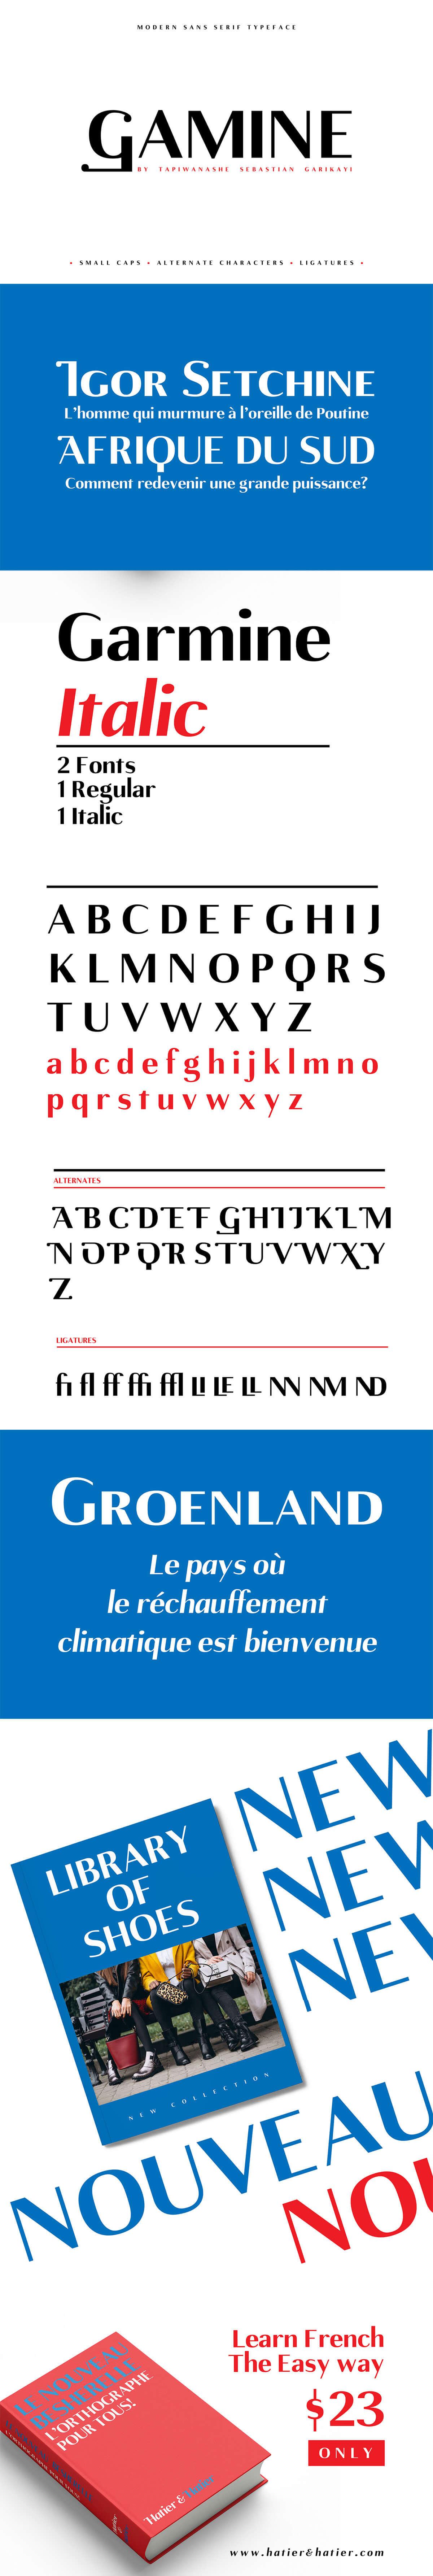 Free Gamine Sans Serif Font Family